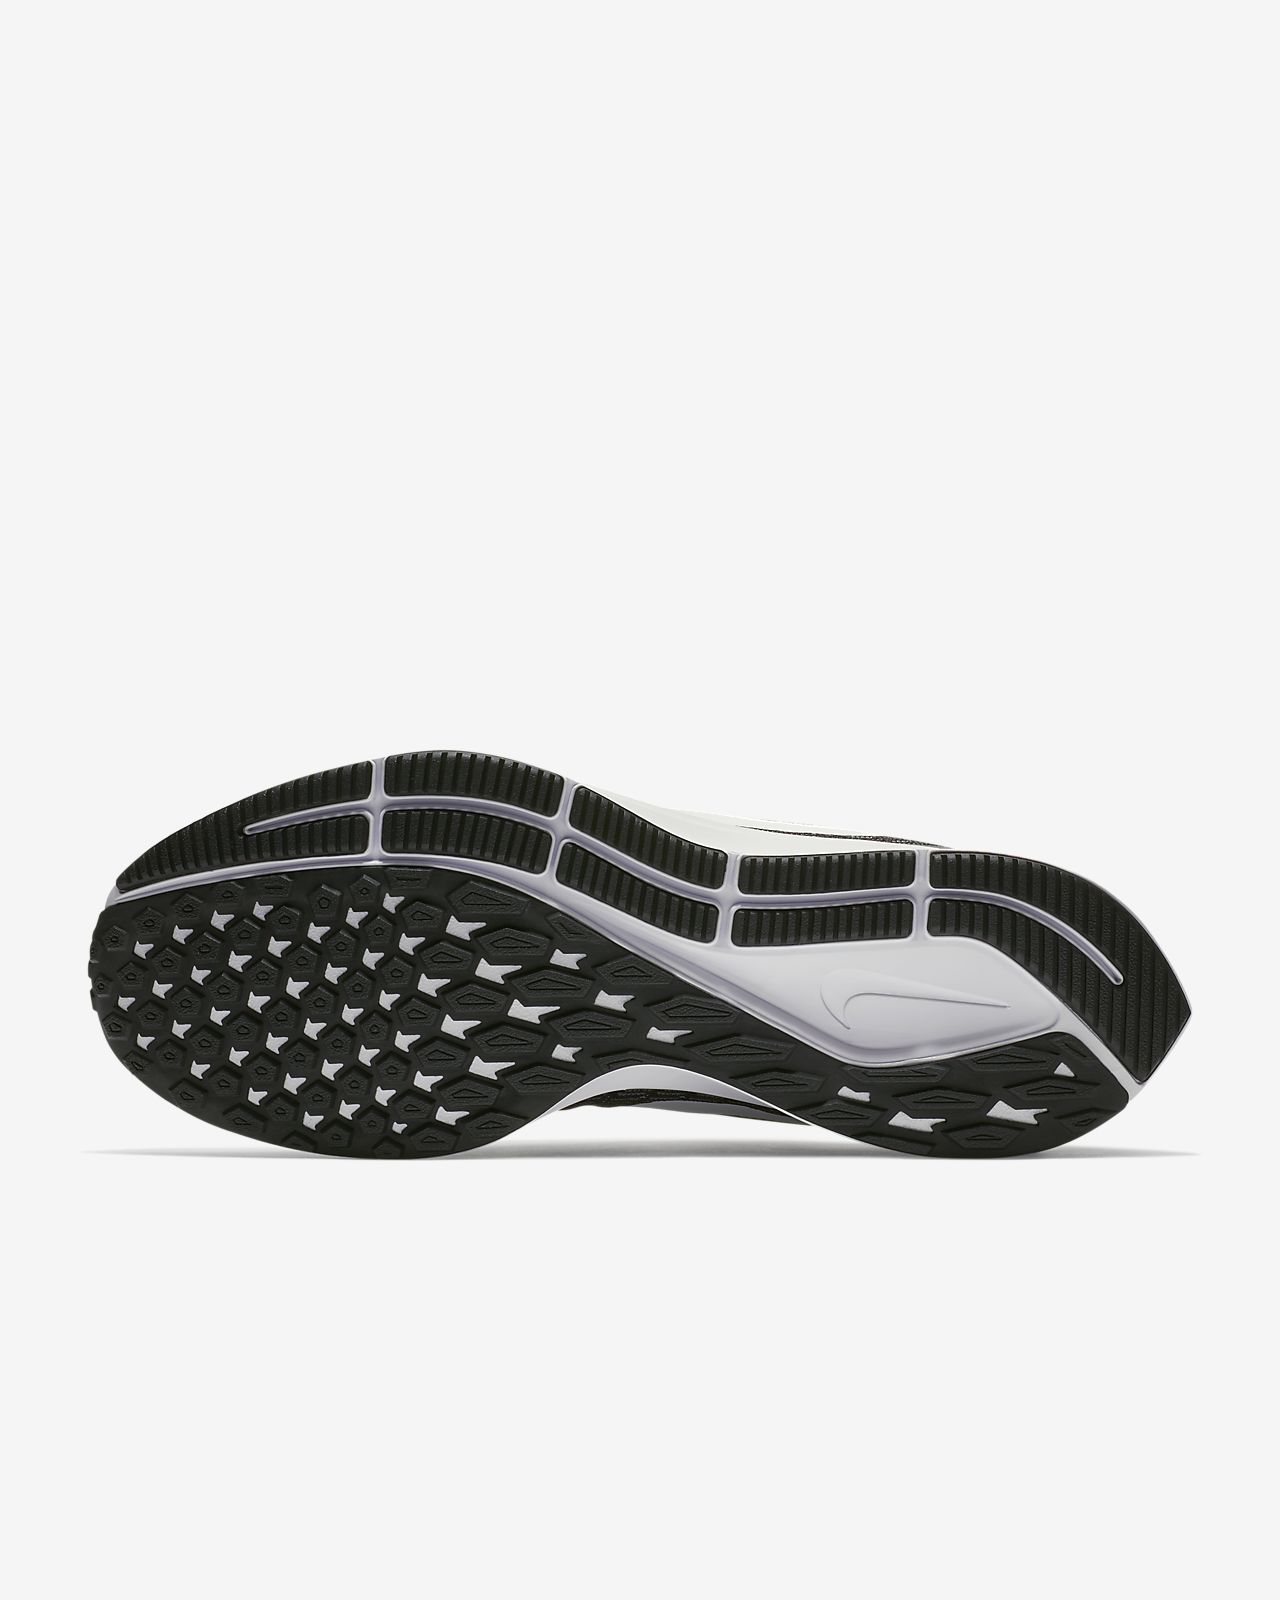 promo code 69b6a 8c3cf ... Chaussure de running Nike Air Zoom Pegasus 35 pour Homme